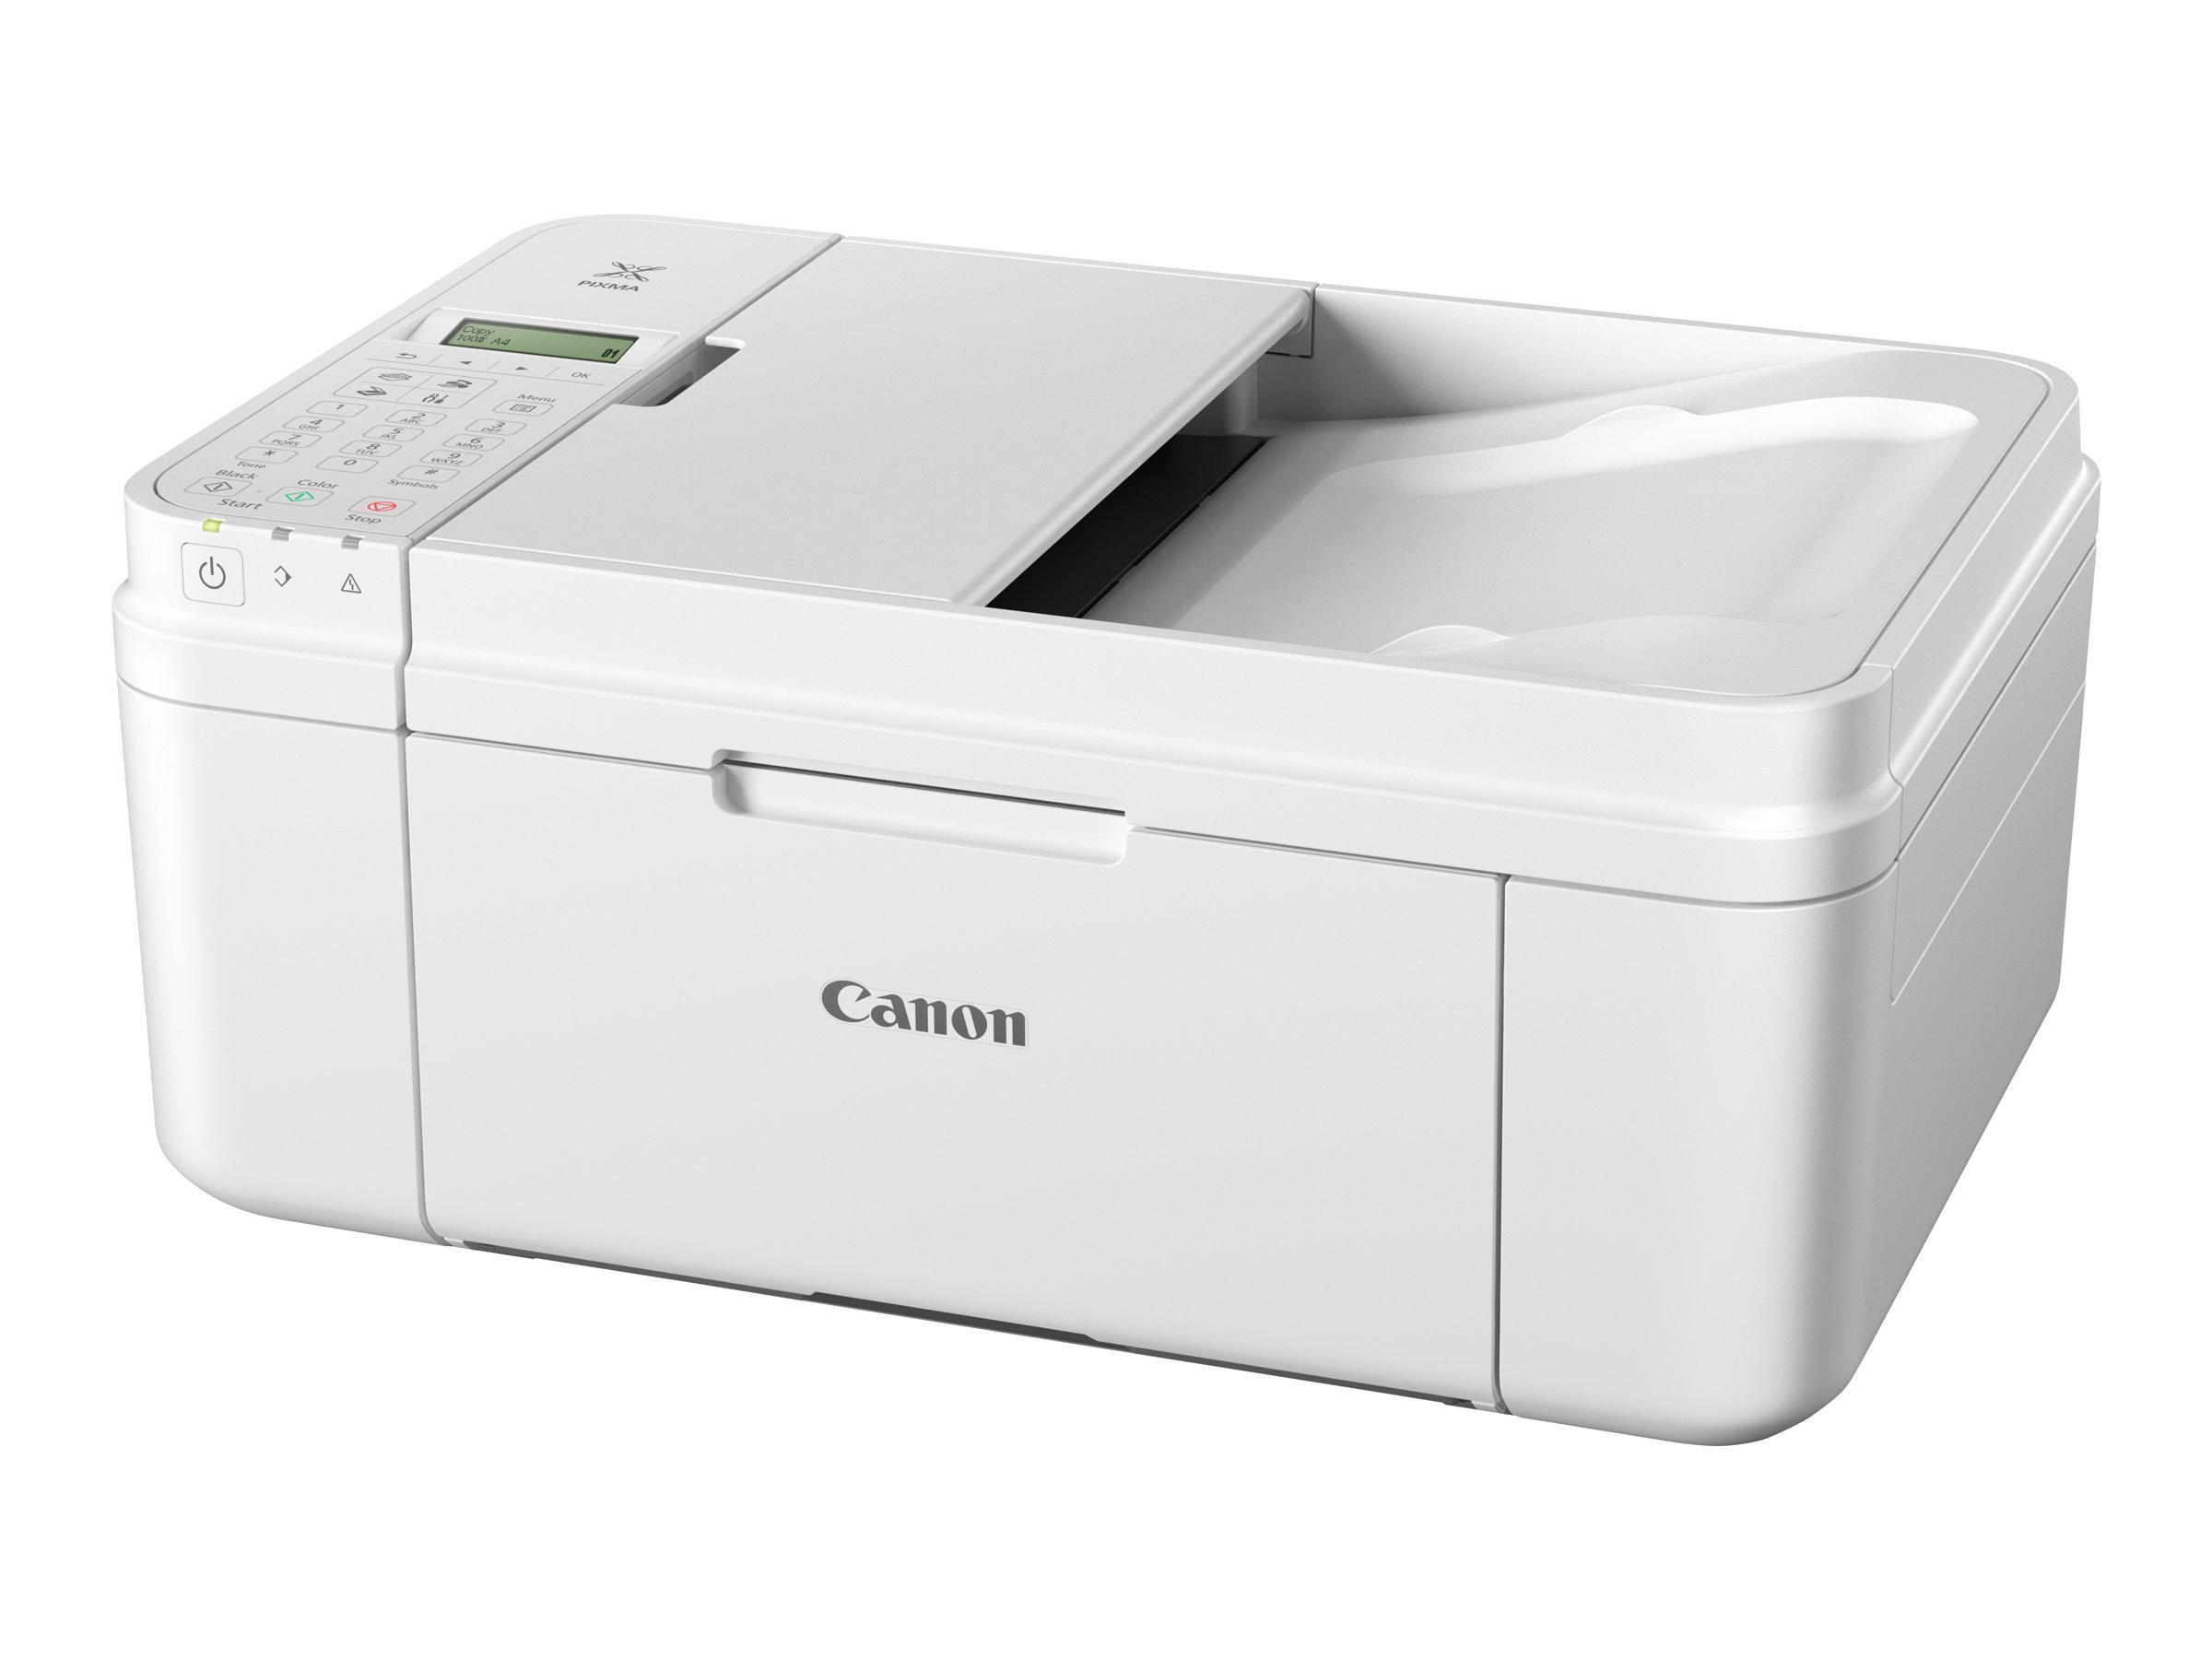 CANON PIXMA MX495 IMPRESORA MULTIFUNCION COLOR CHO